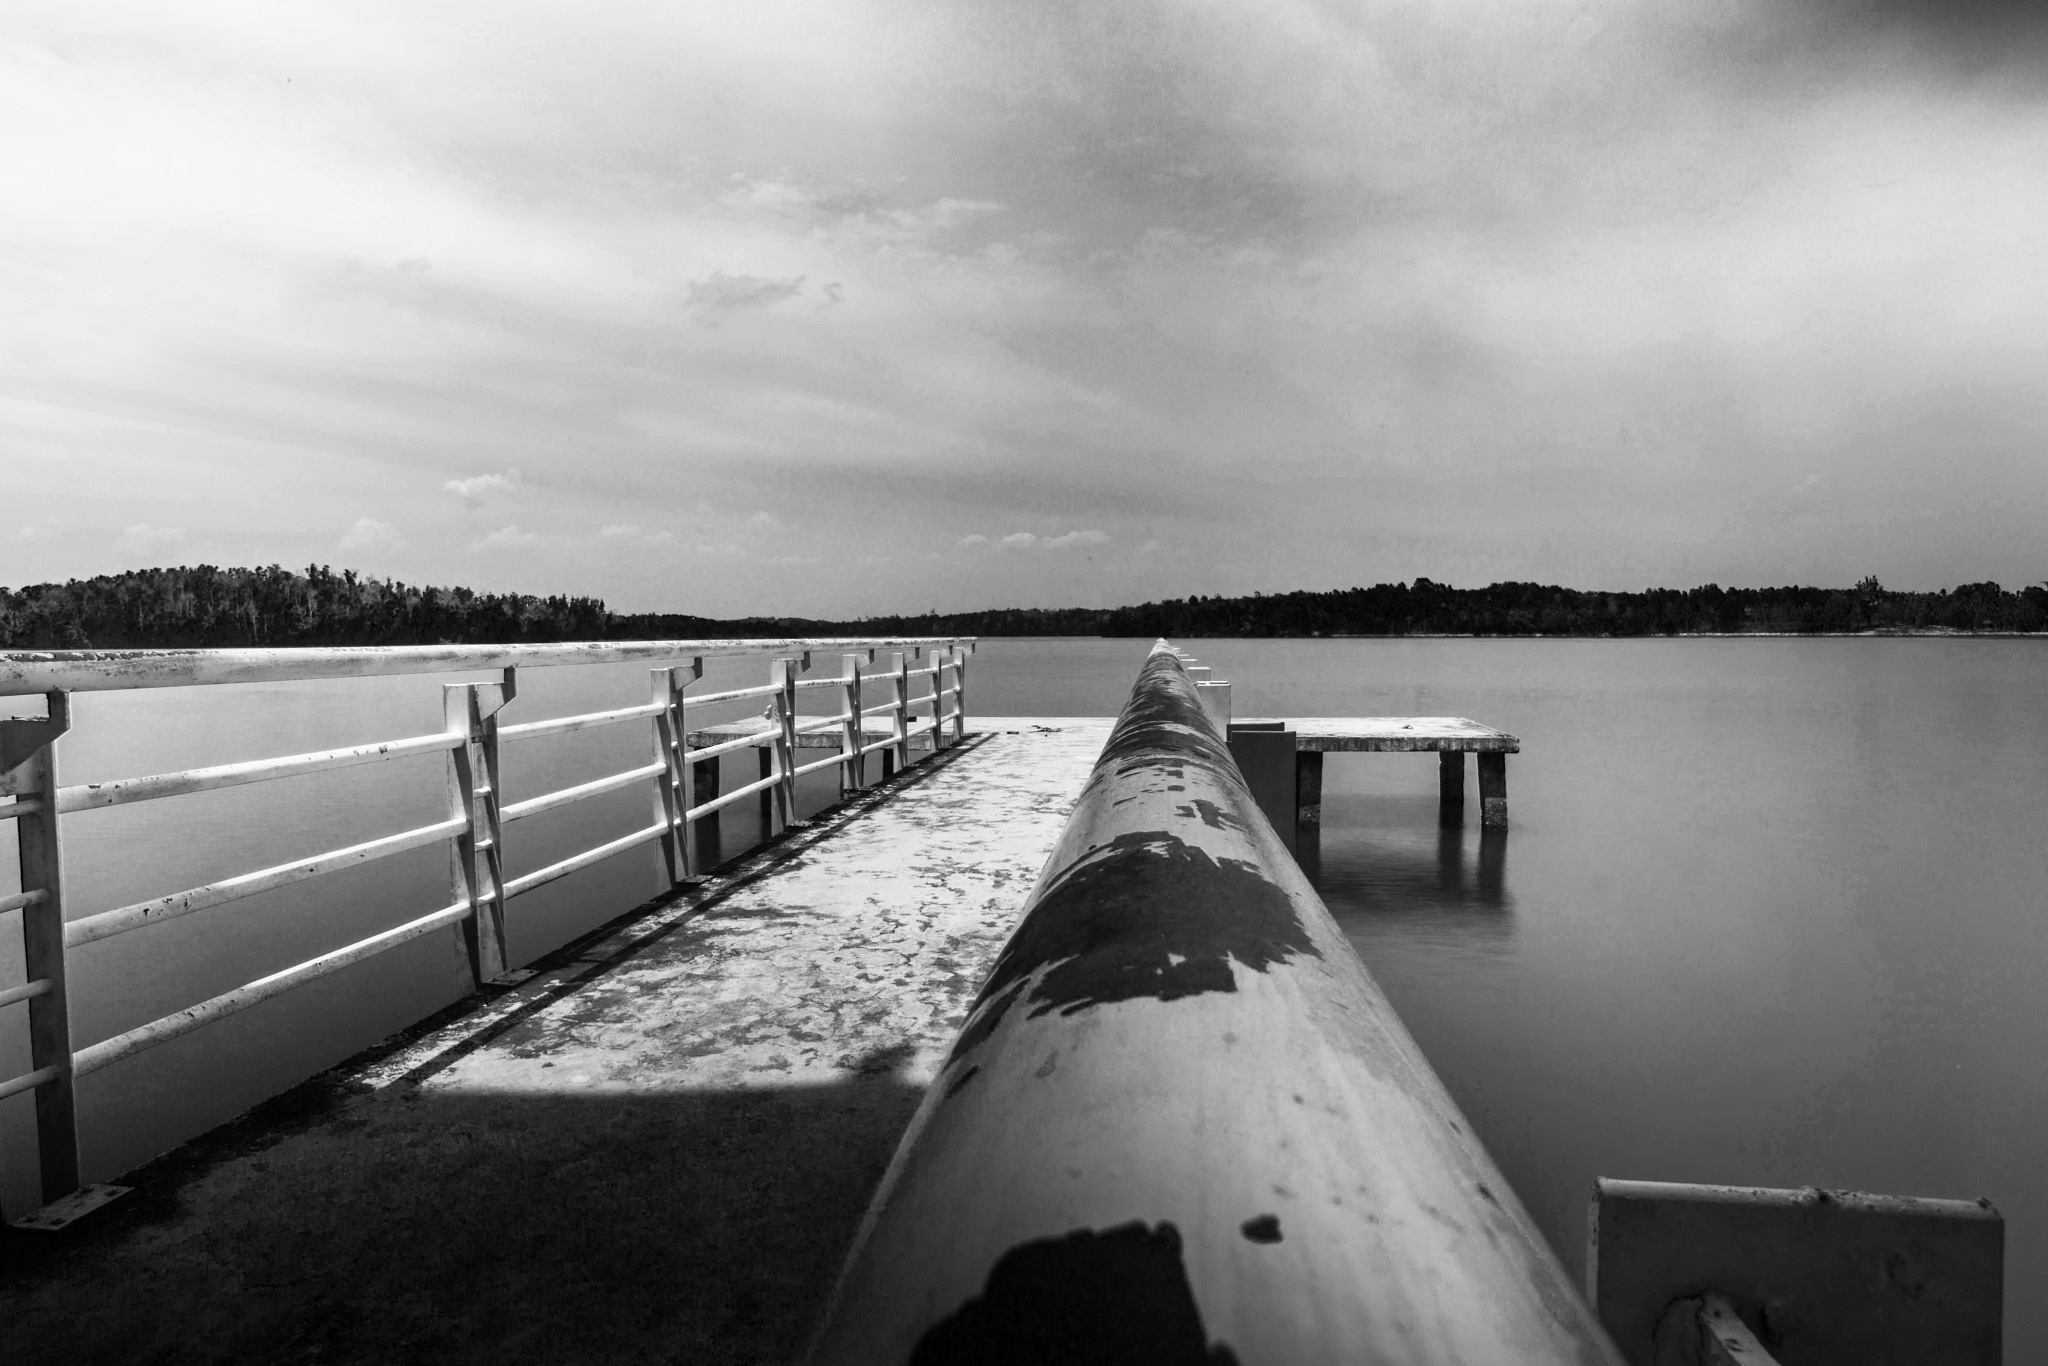 Limbungan Lake B&W by Syafri Gamal